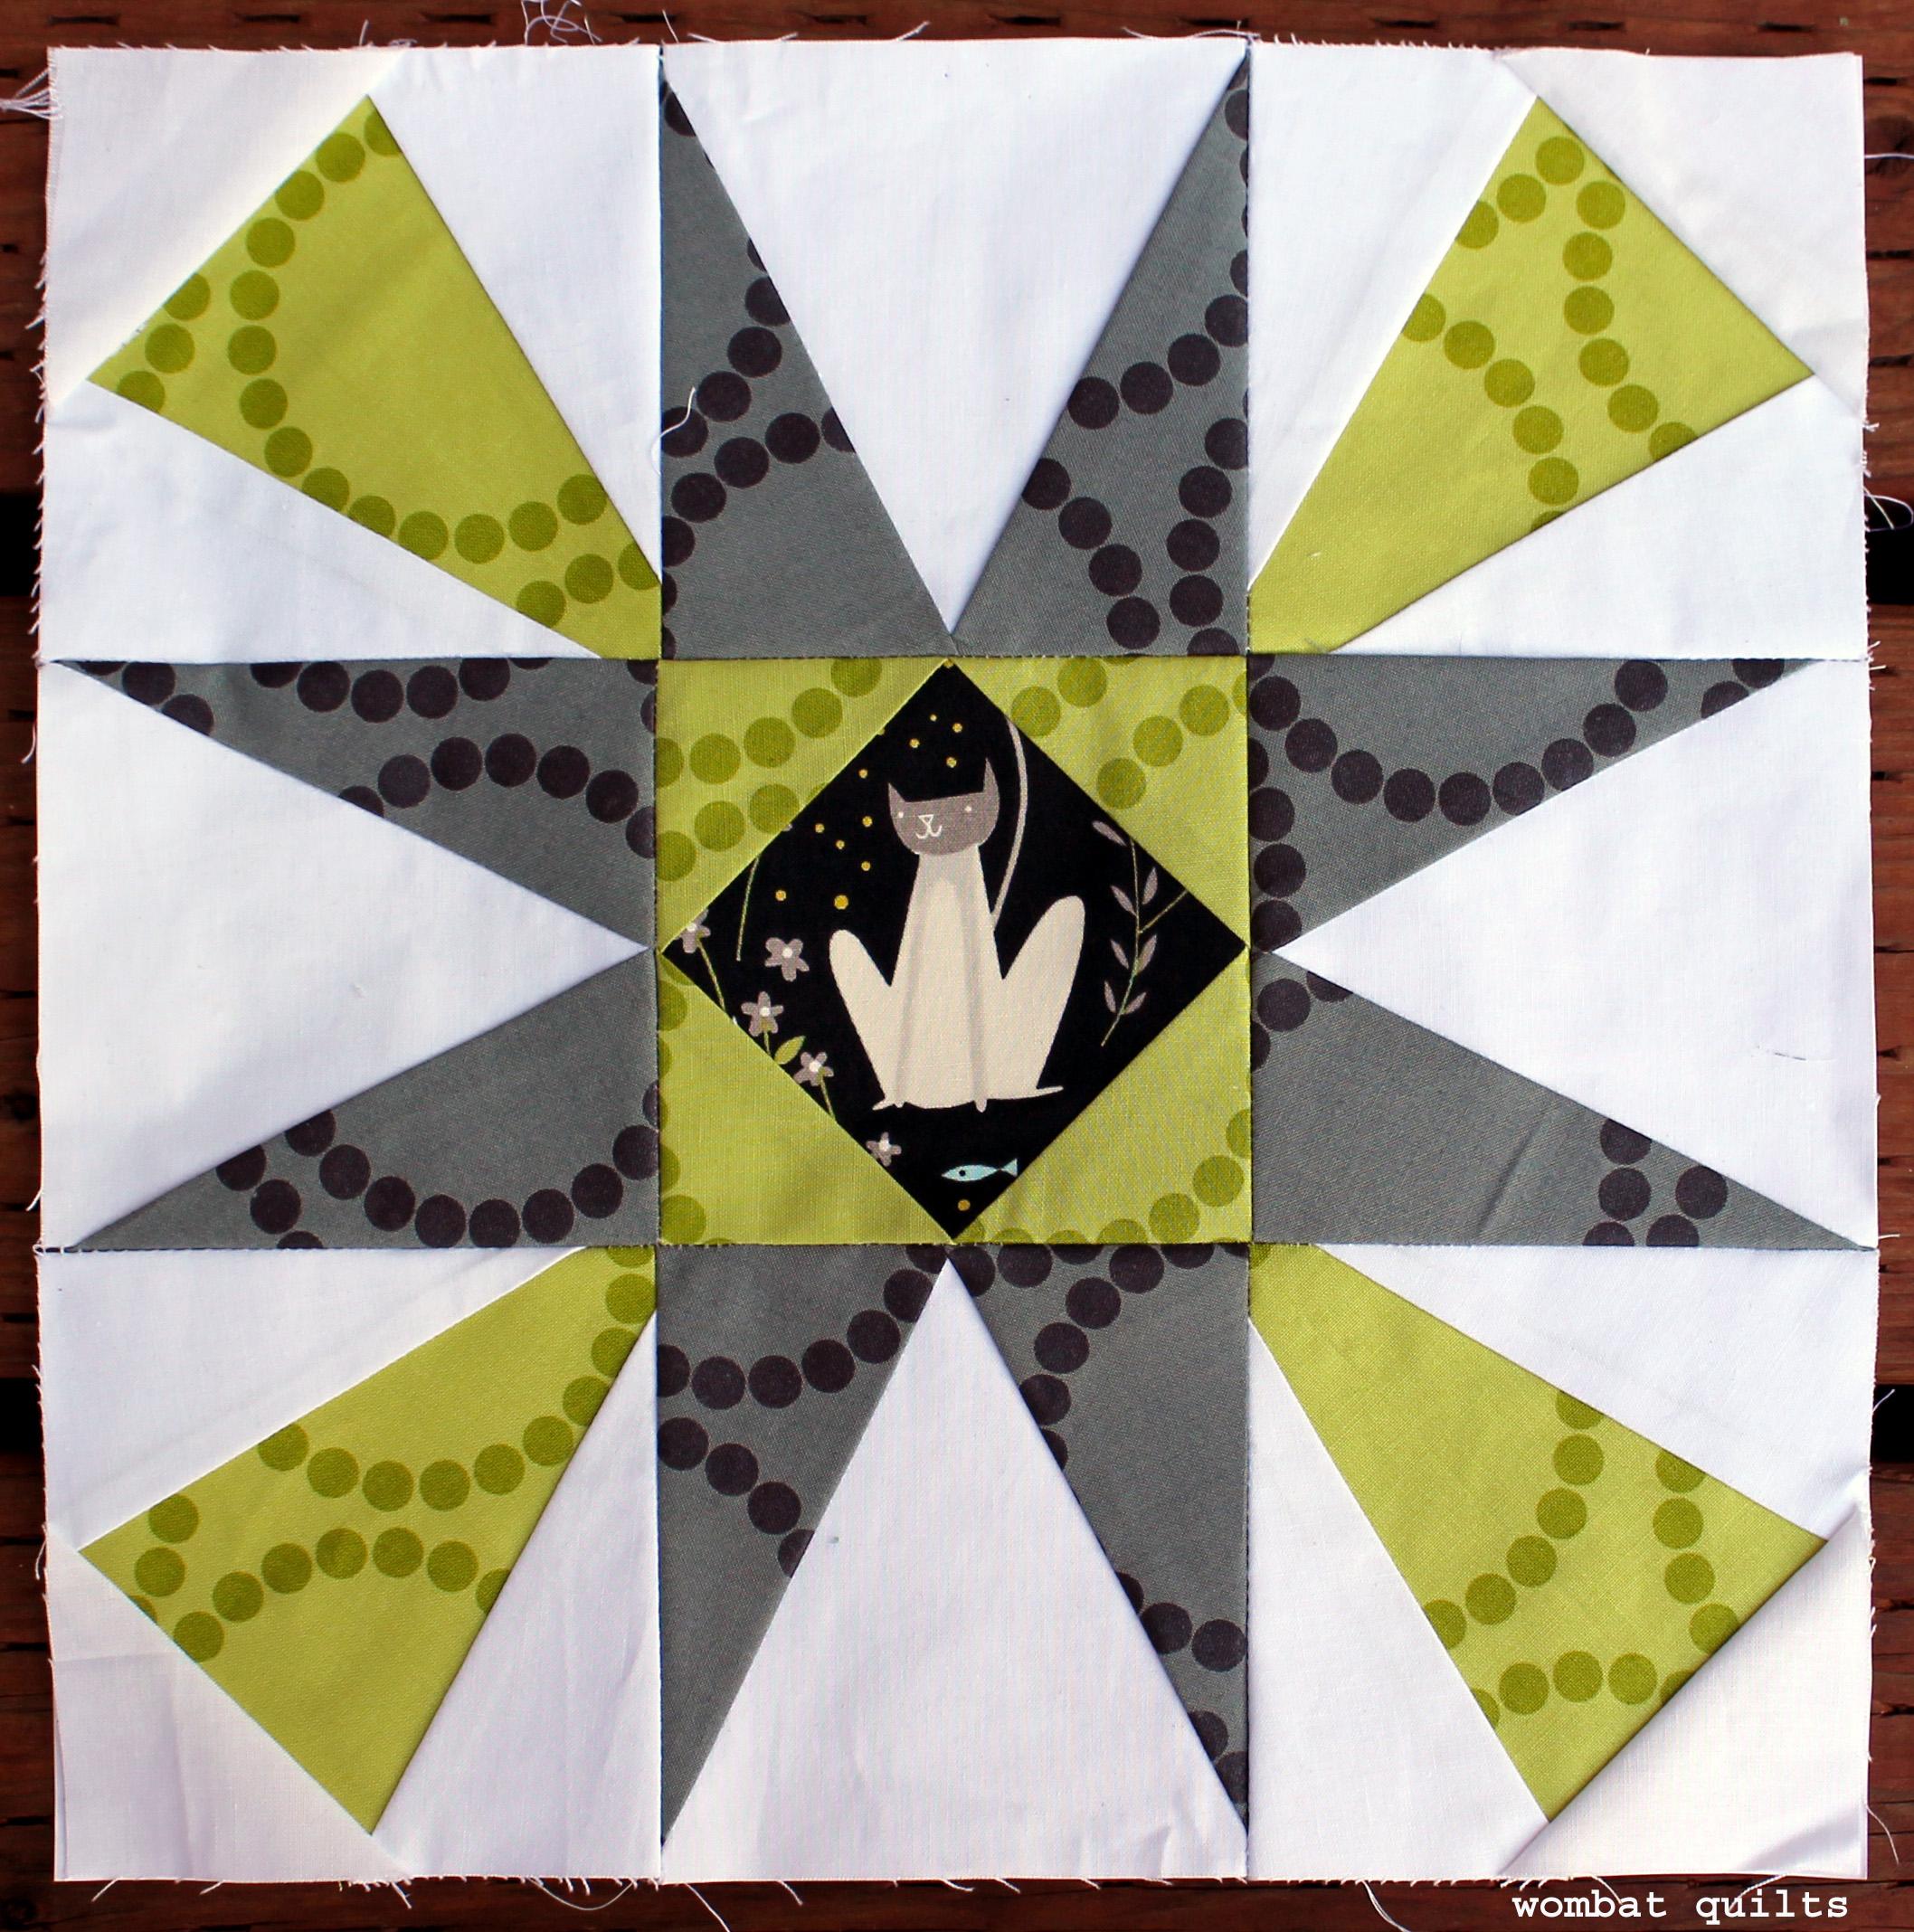 Starflower Quilt block | WOMBAT QUILTS : star flower quilt block pattern - Adamdwight.com